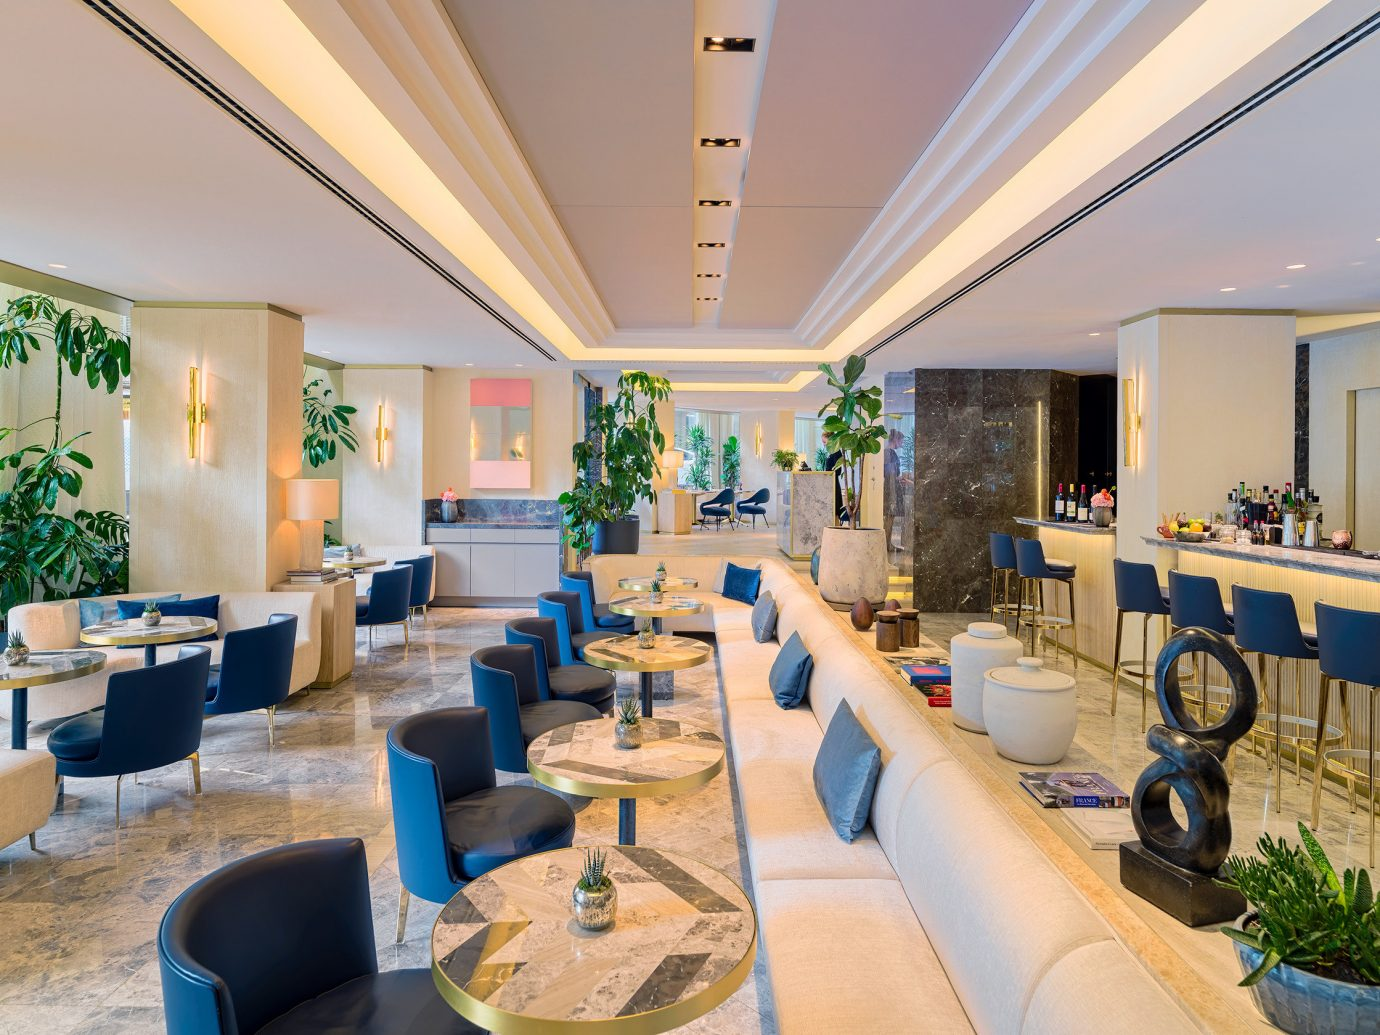 Barcelona Hotels Spain indoor Living floor window room furniture ceiling interior design Lobby restaurant decorated area